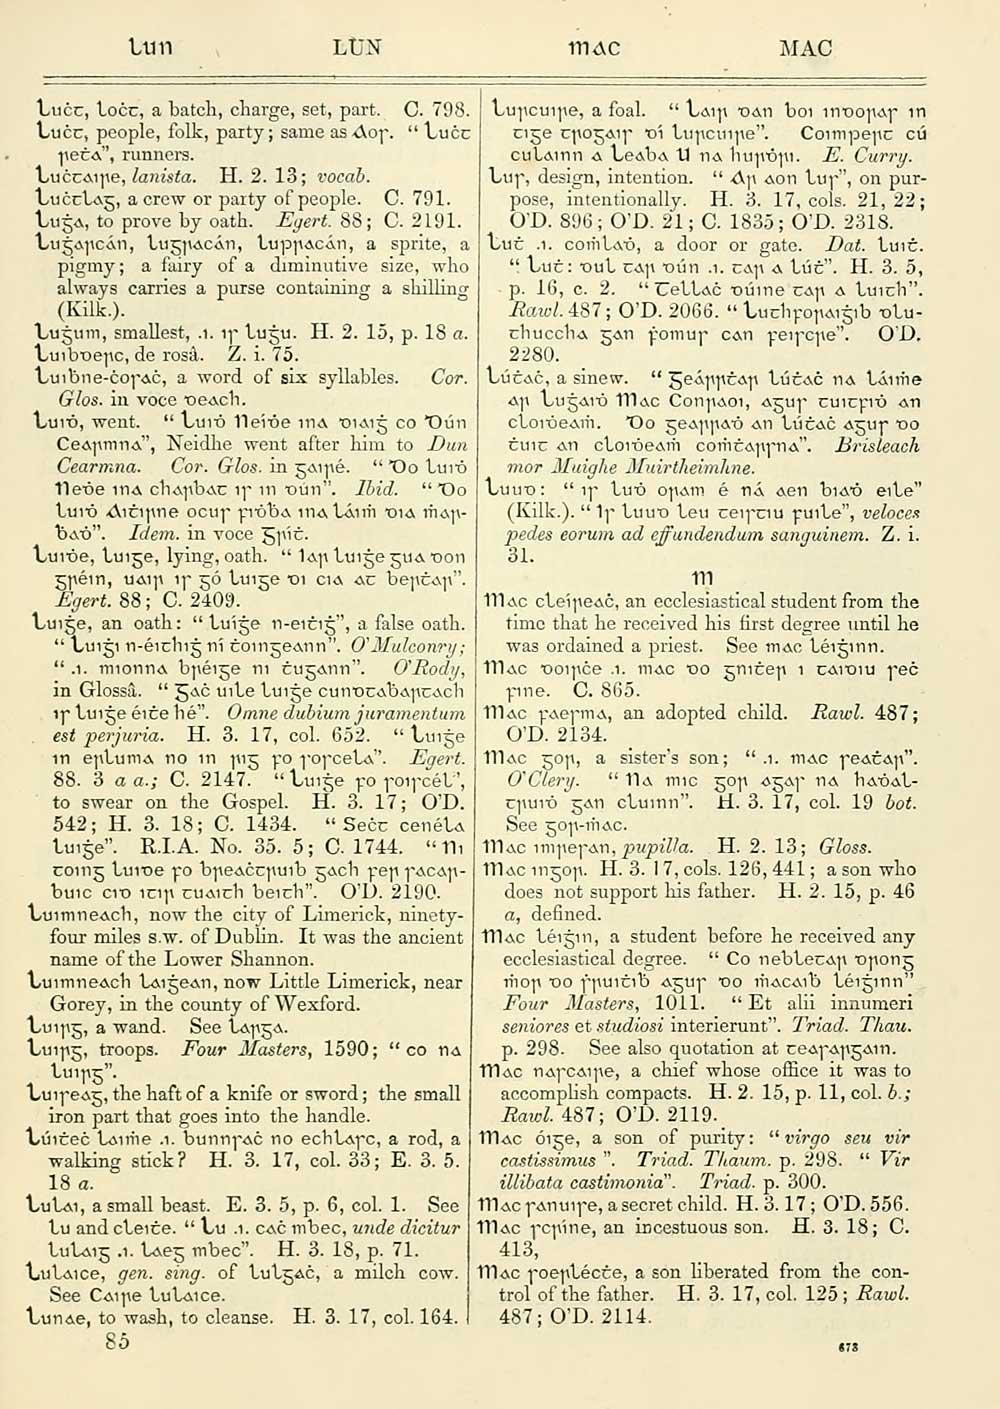 685) - J  F  Campbell Collection > Irish-English dictionary